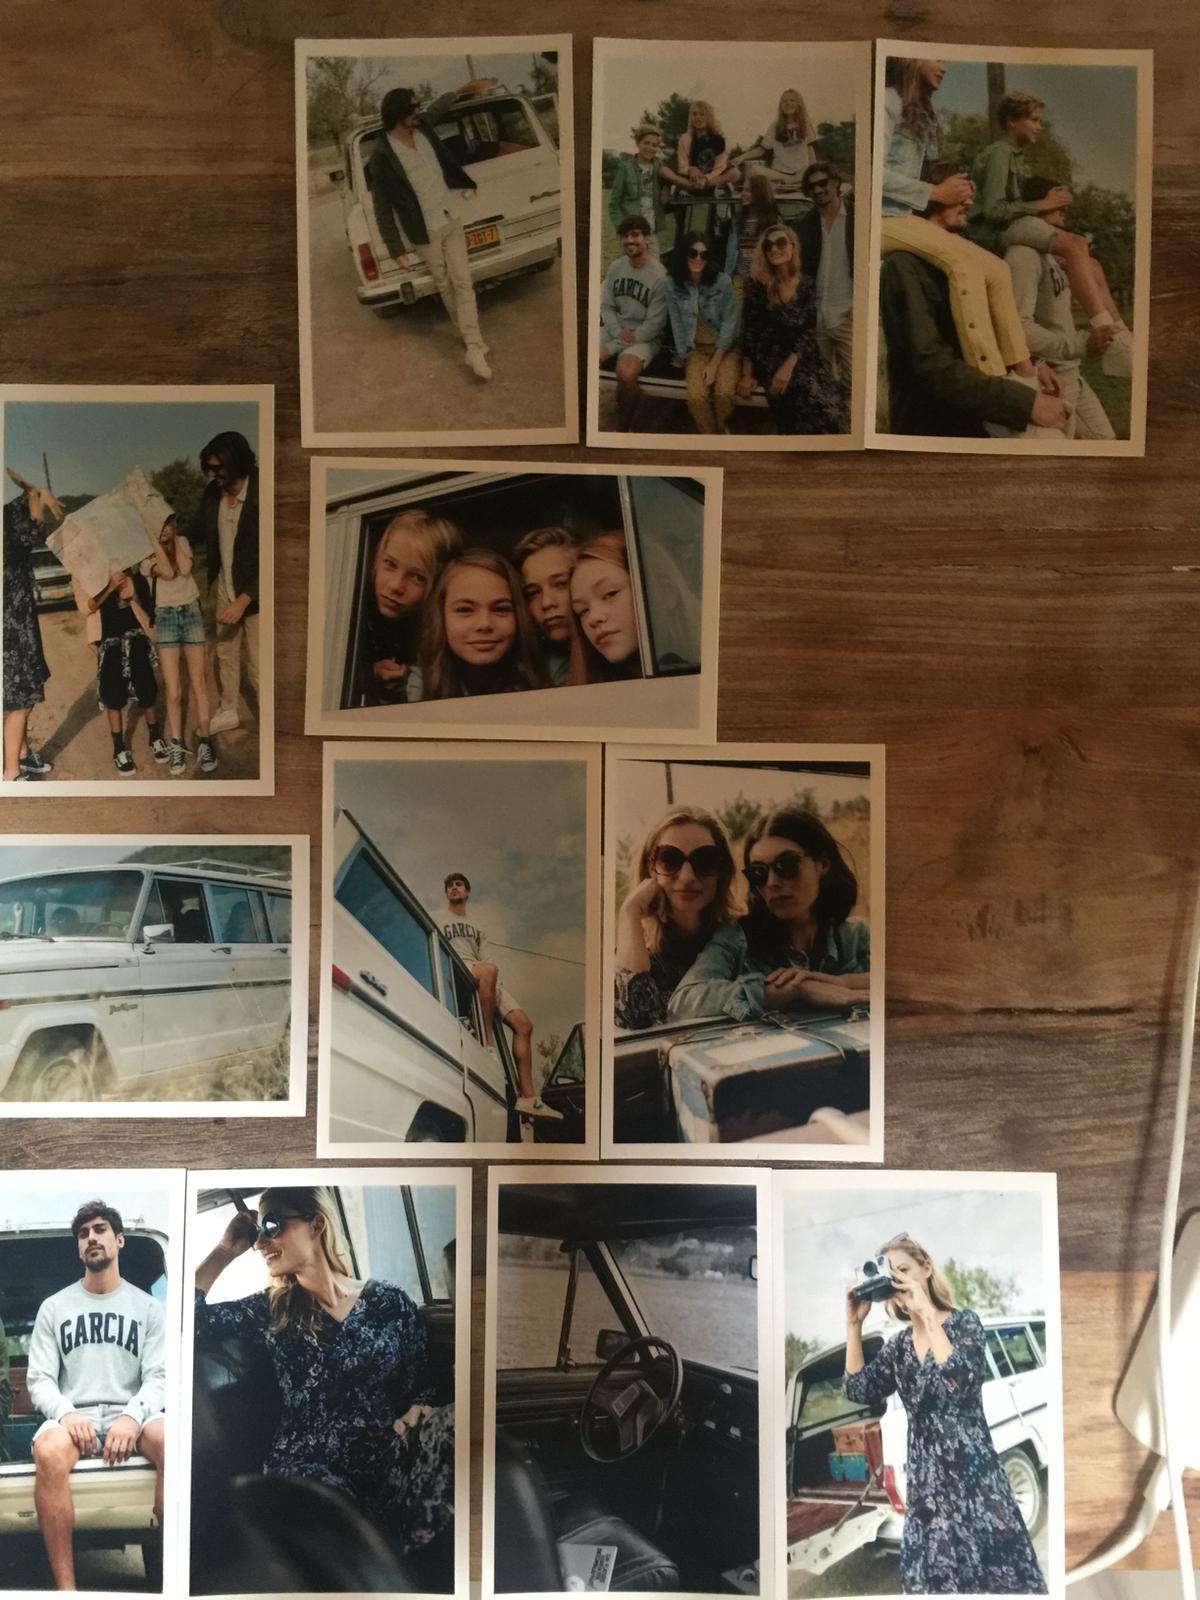 photoshoot for Gracia